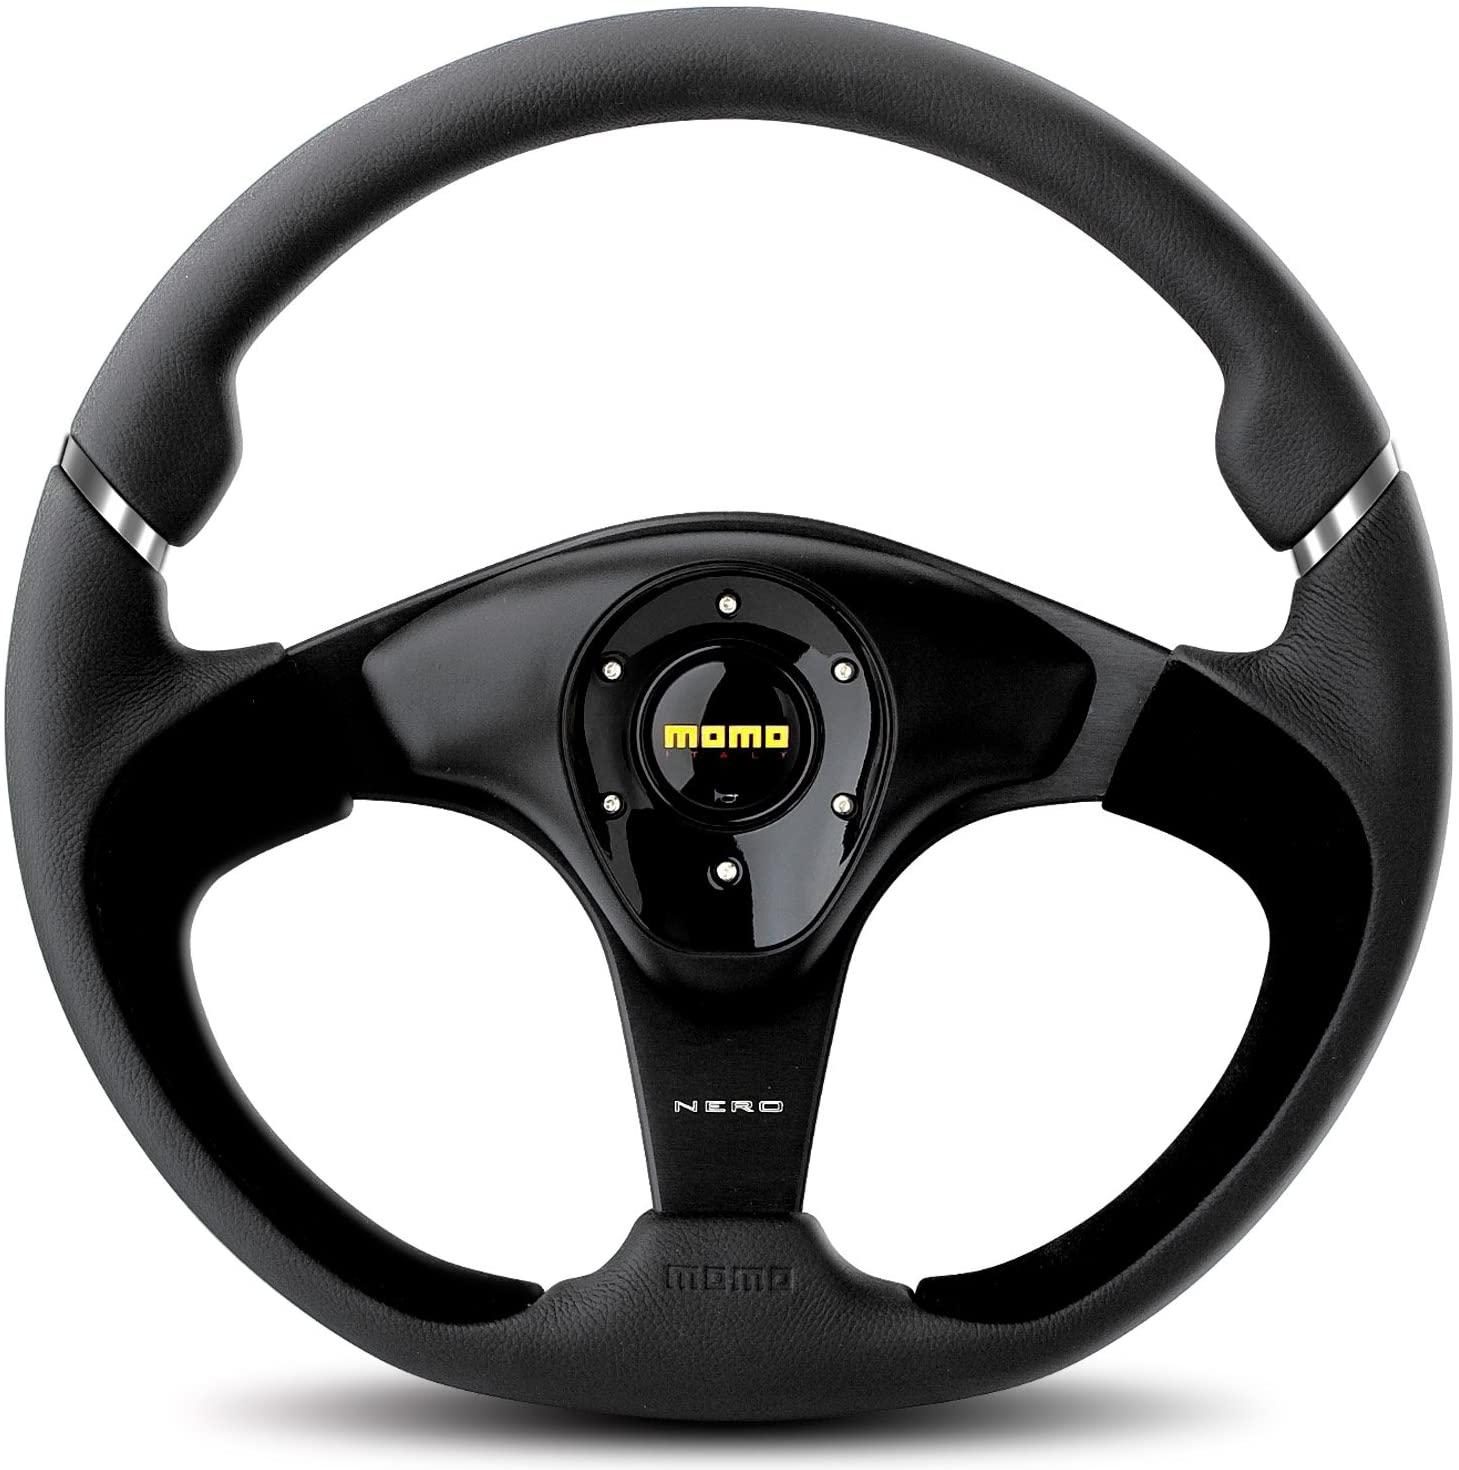 MOMO NER35BK0B Nero 350 mm Leather Steering Wheel